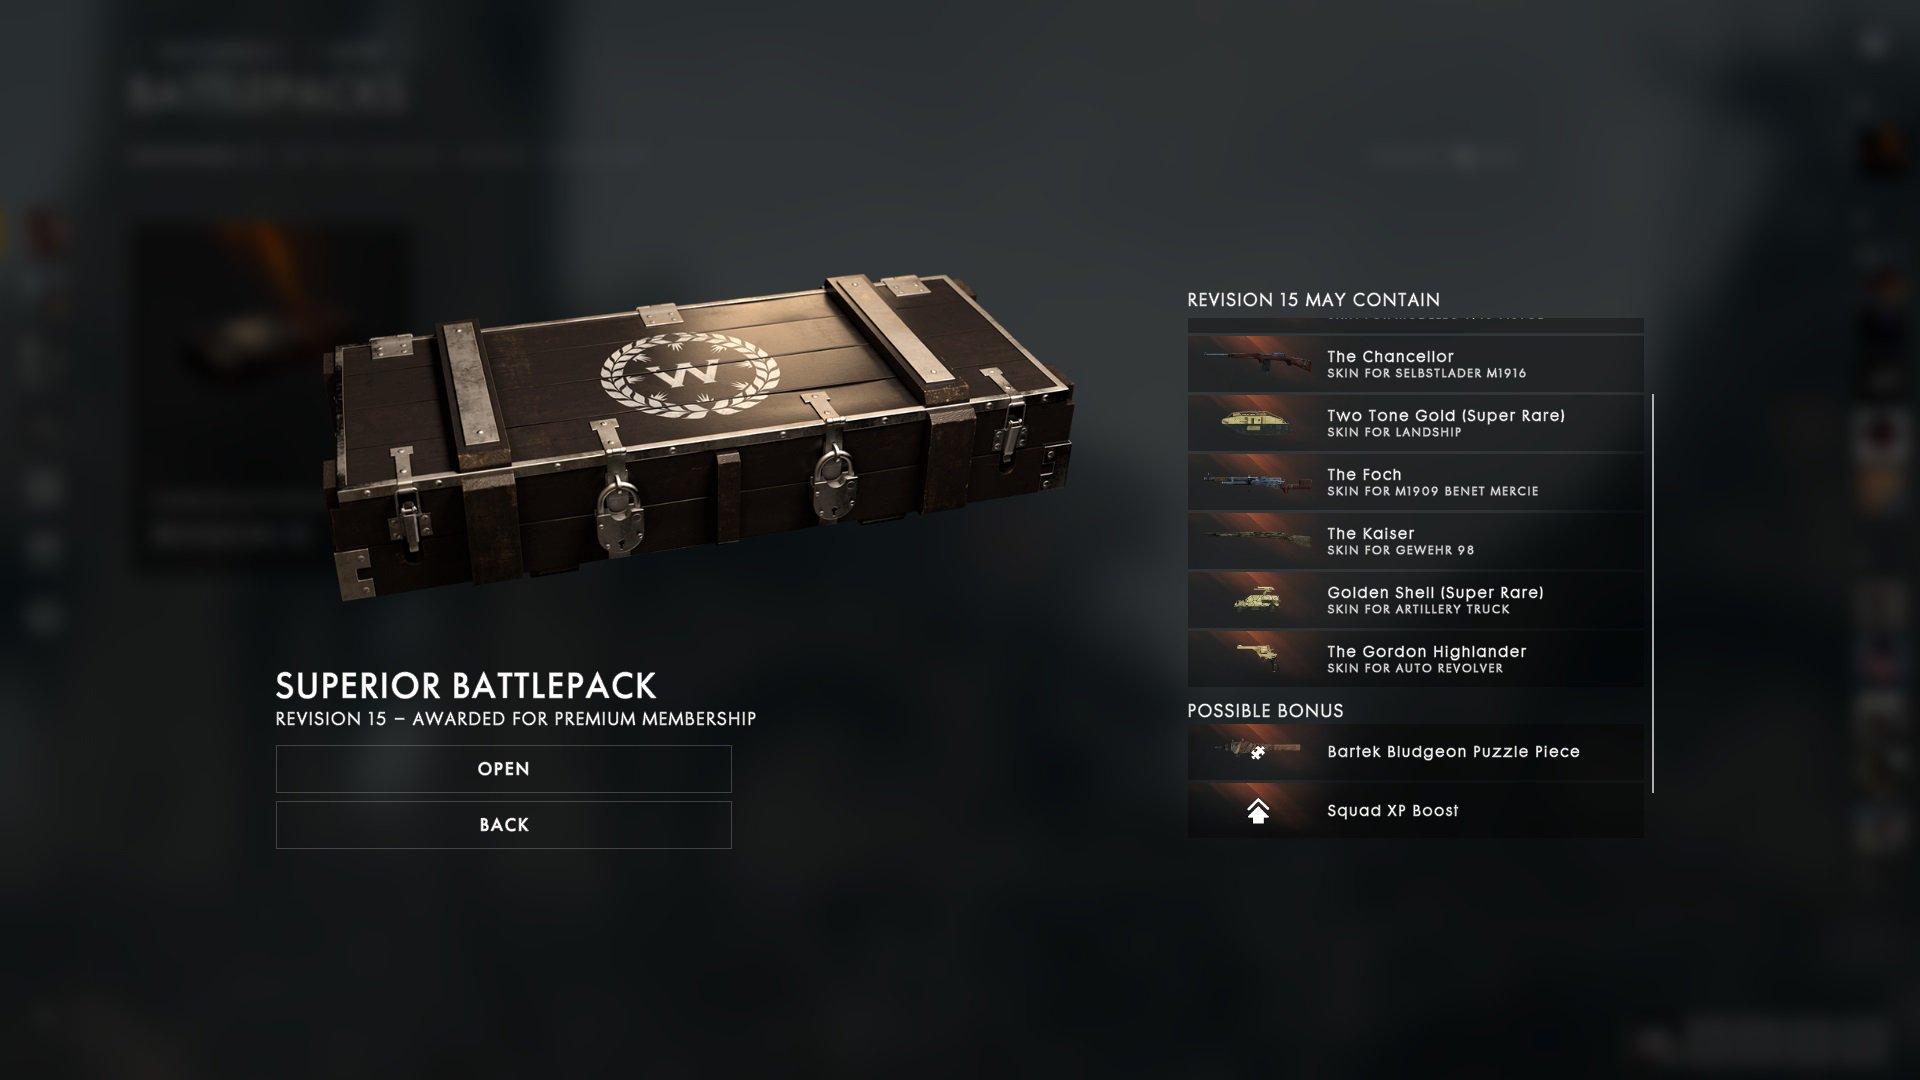 Battlefield 1 Premium Battlepack (Februar 2017)